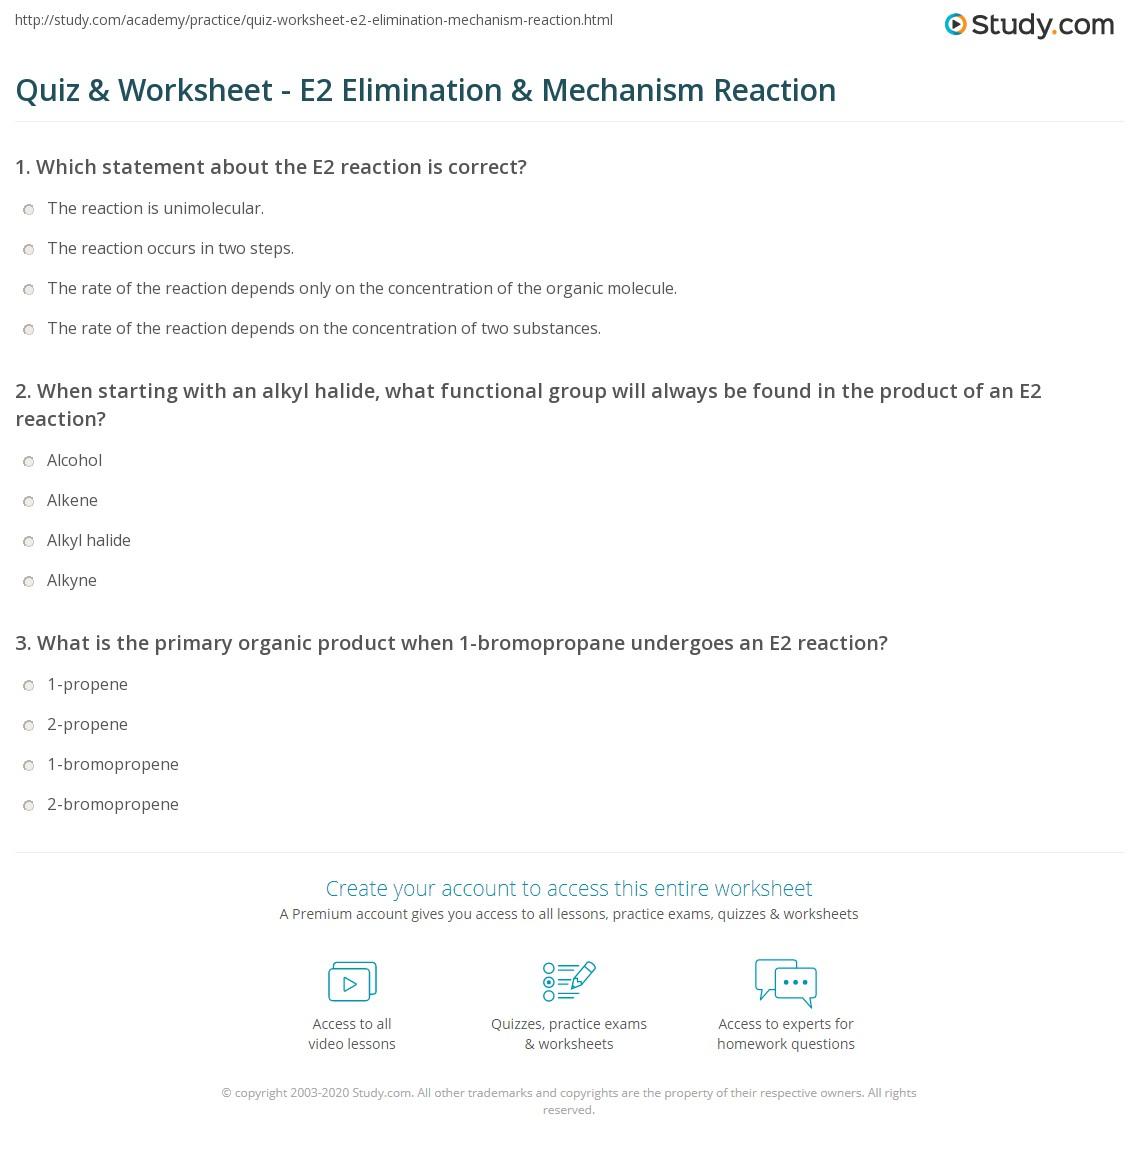 Quiz & Worksheet - E2 Elimination & Mechanism Reaction | Study com